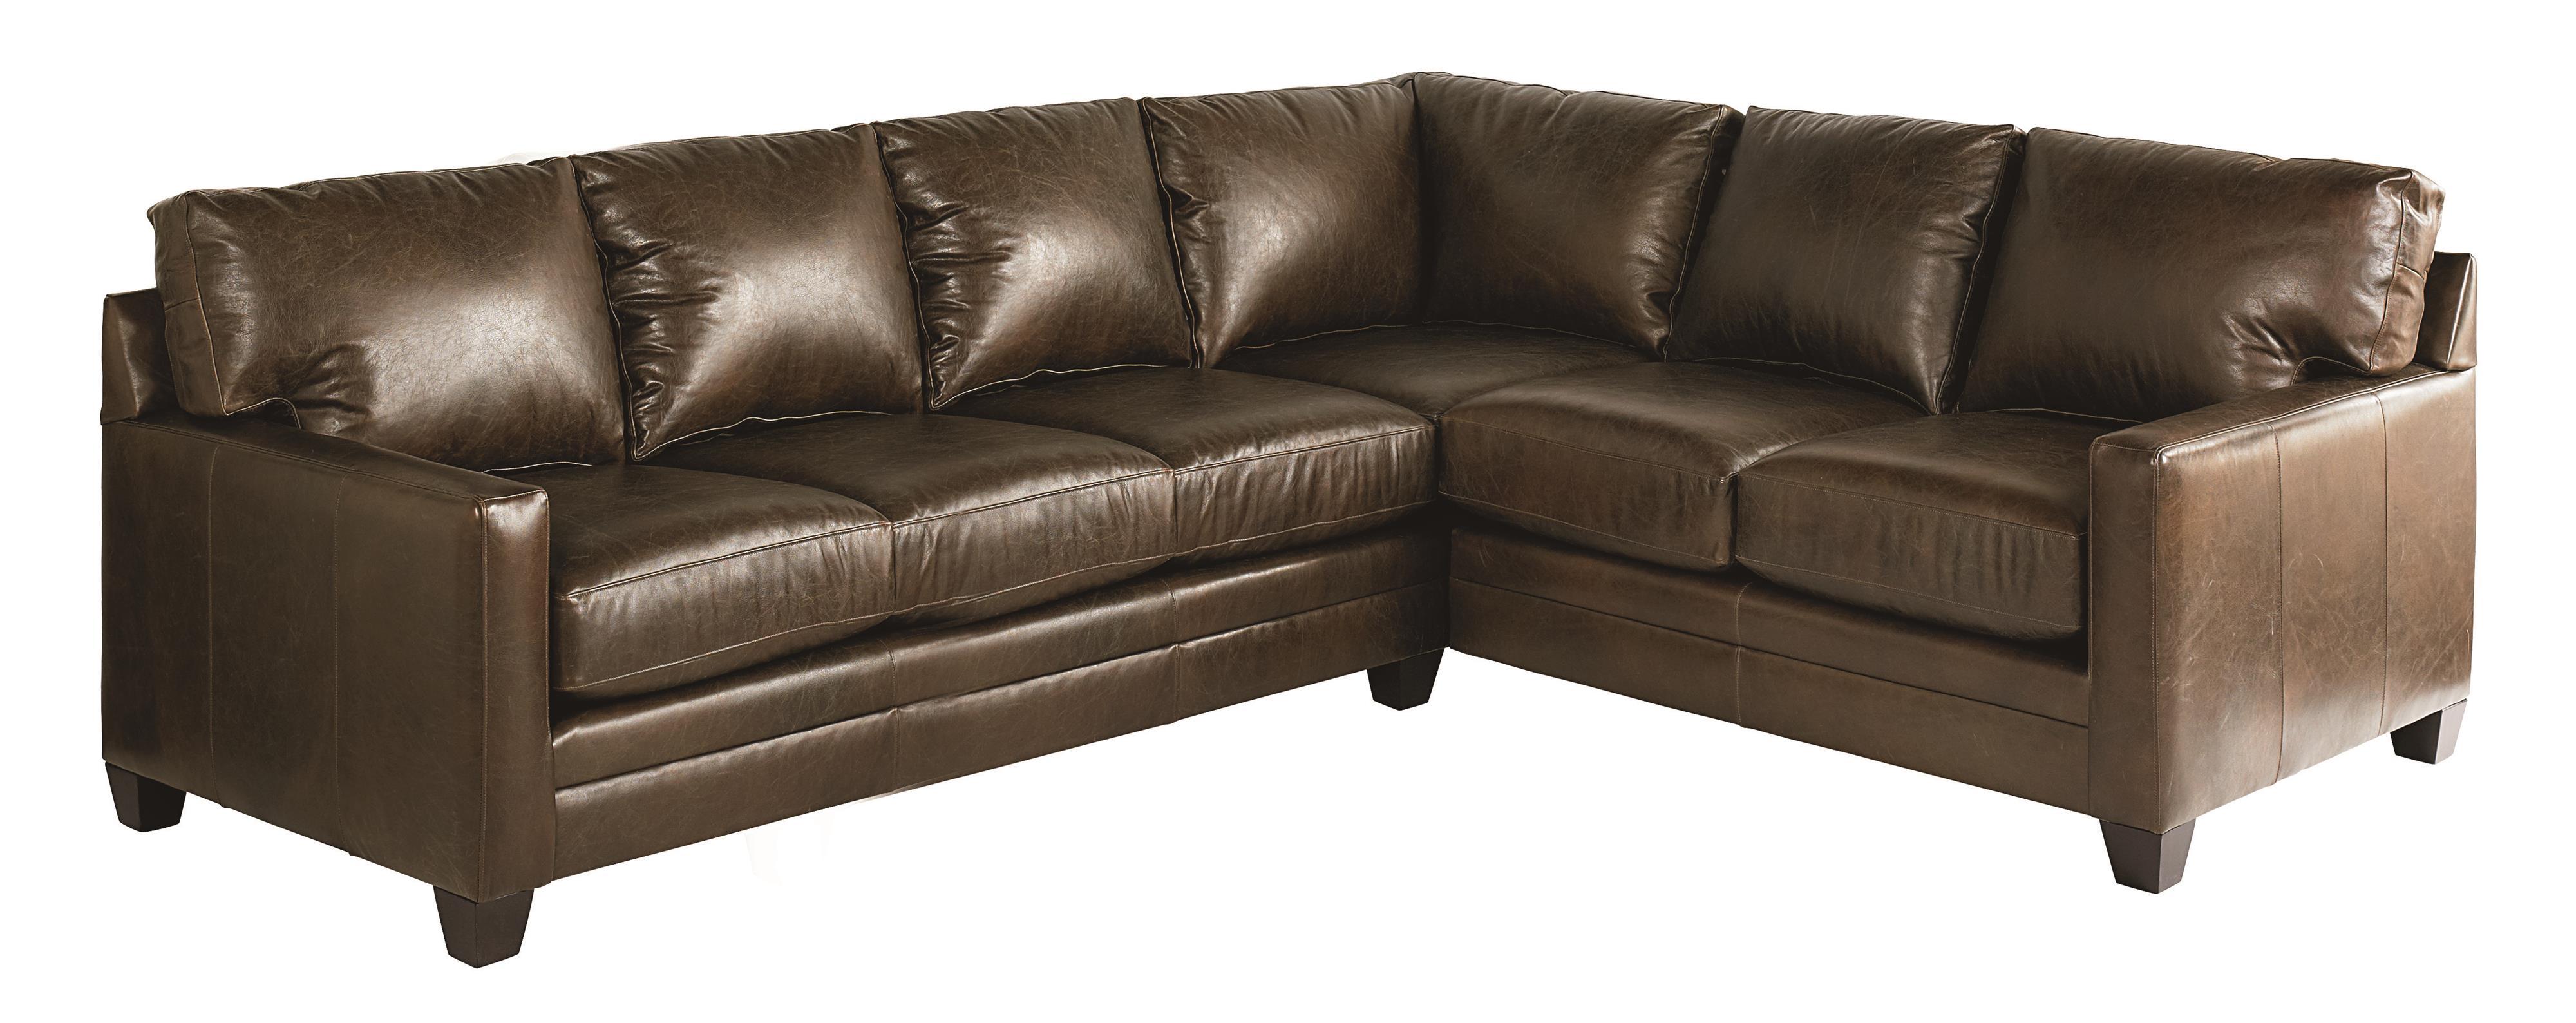 Bassett Ladson Sectional Sofa Esprit Decor Home